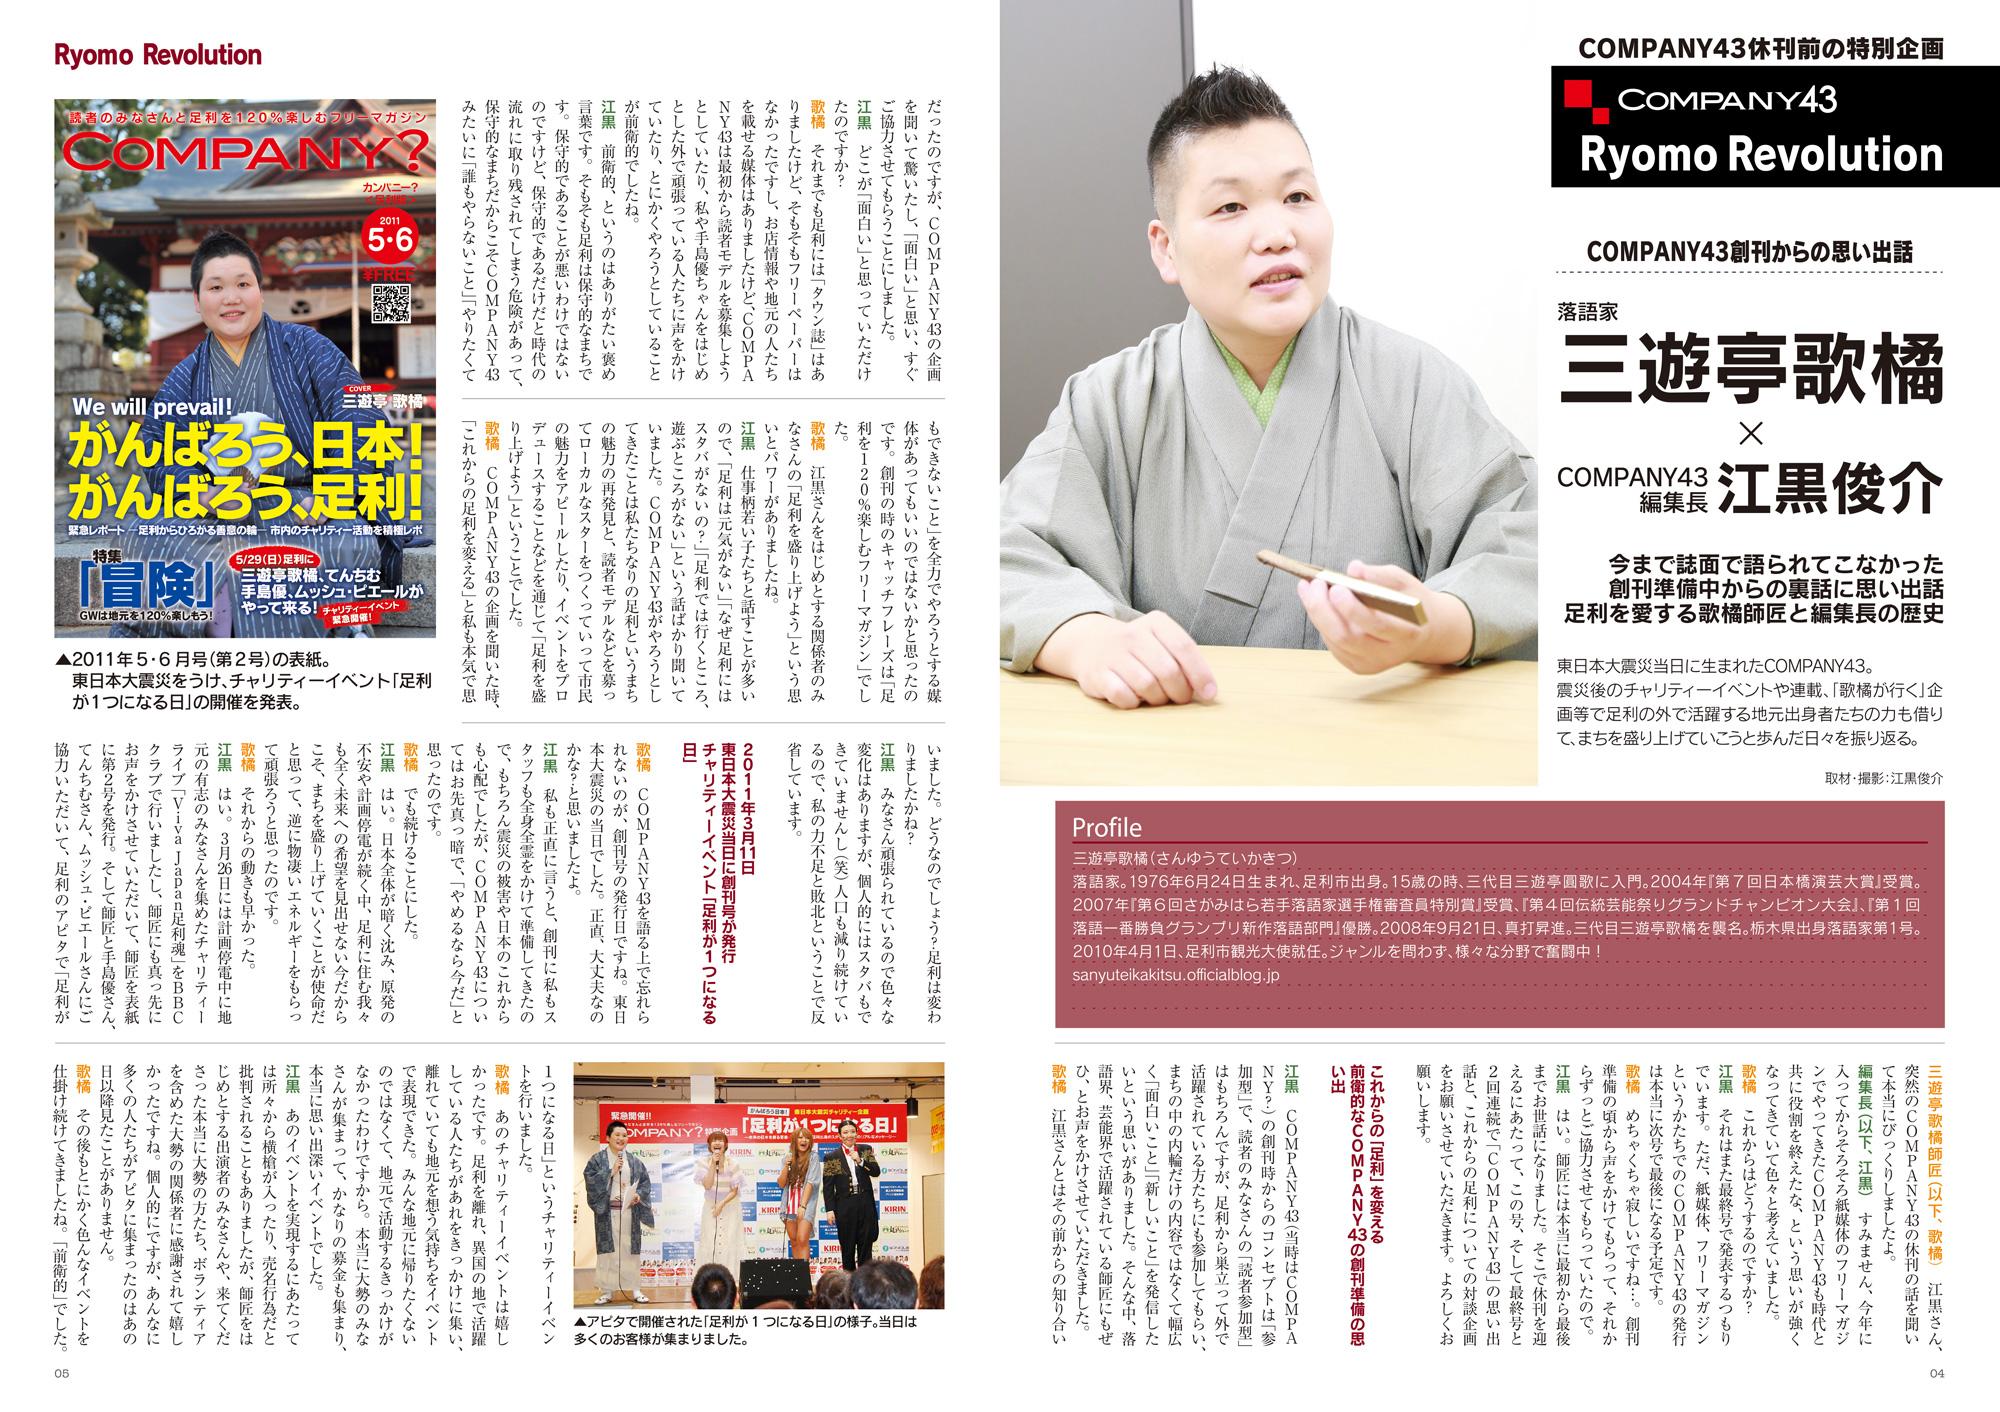 COMPANY43休刊前の特別企画 Ryomo Revolution